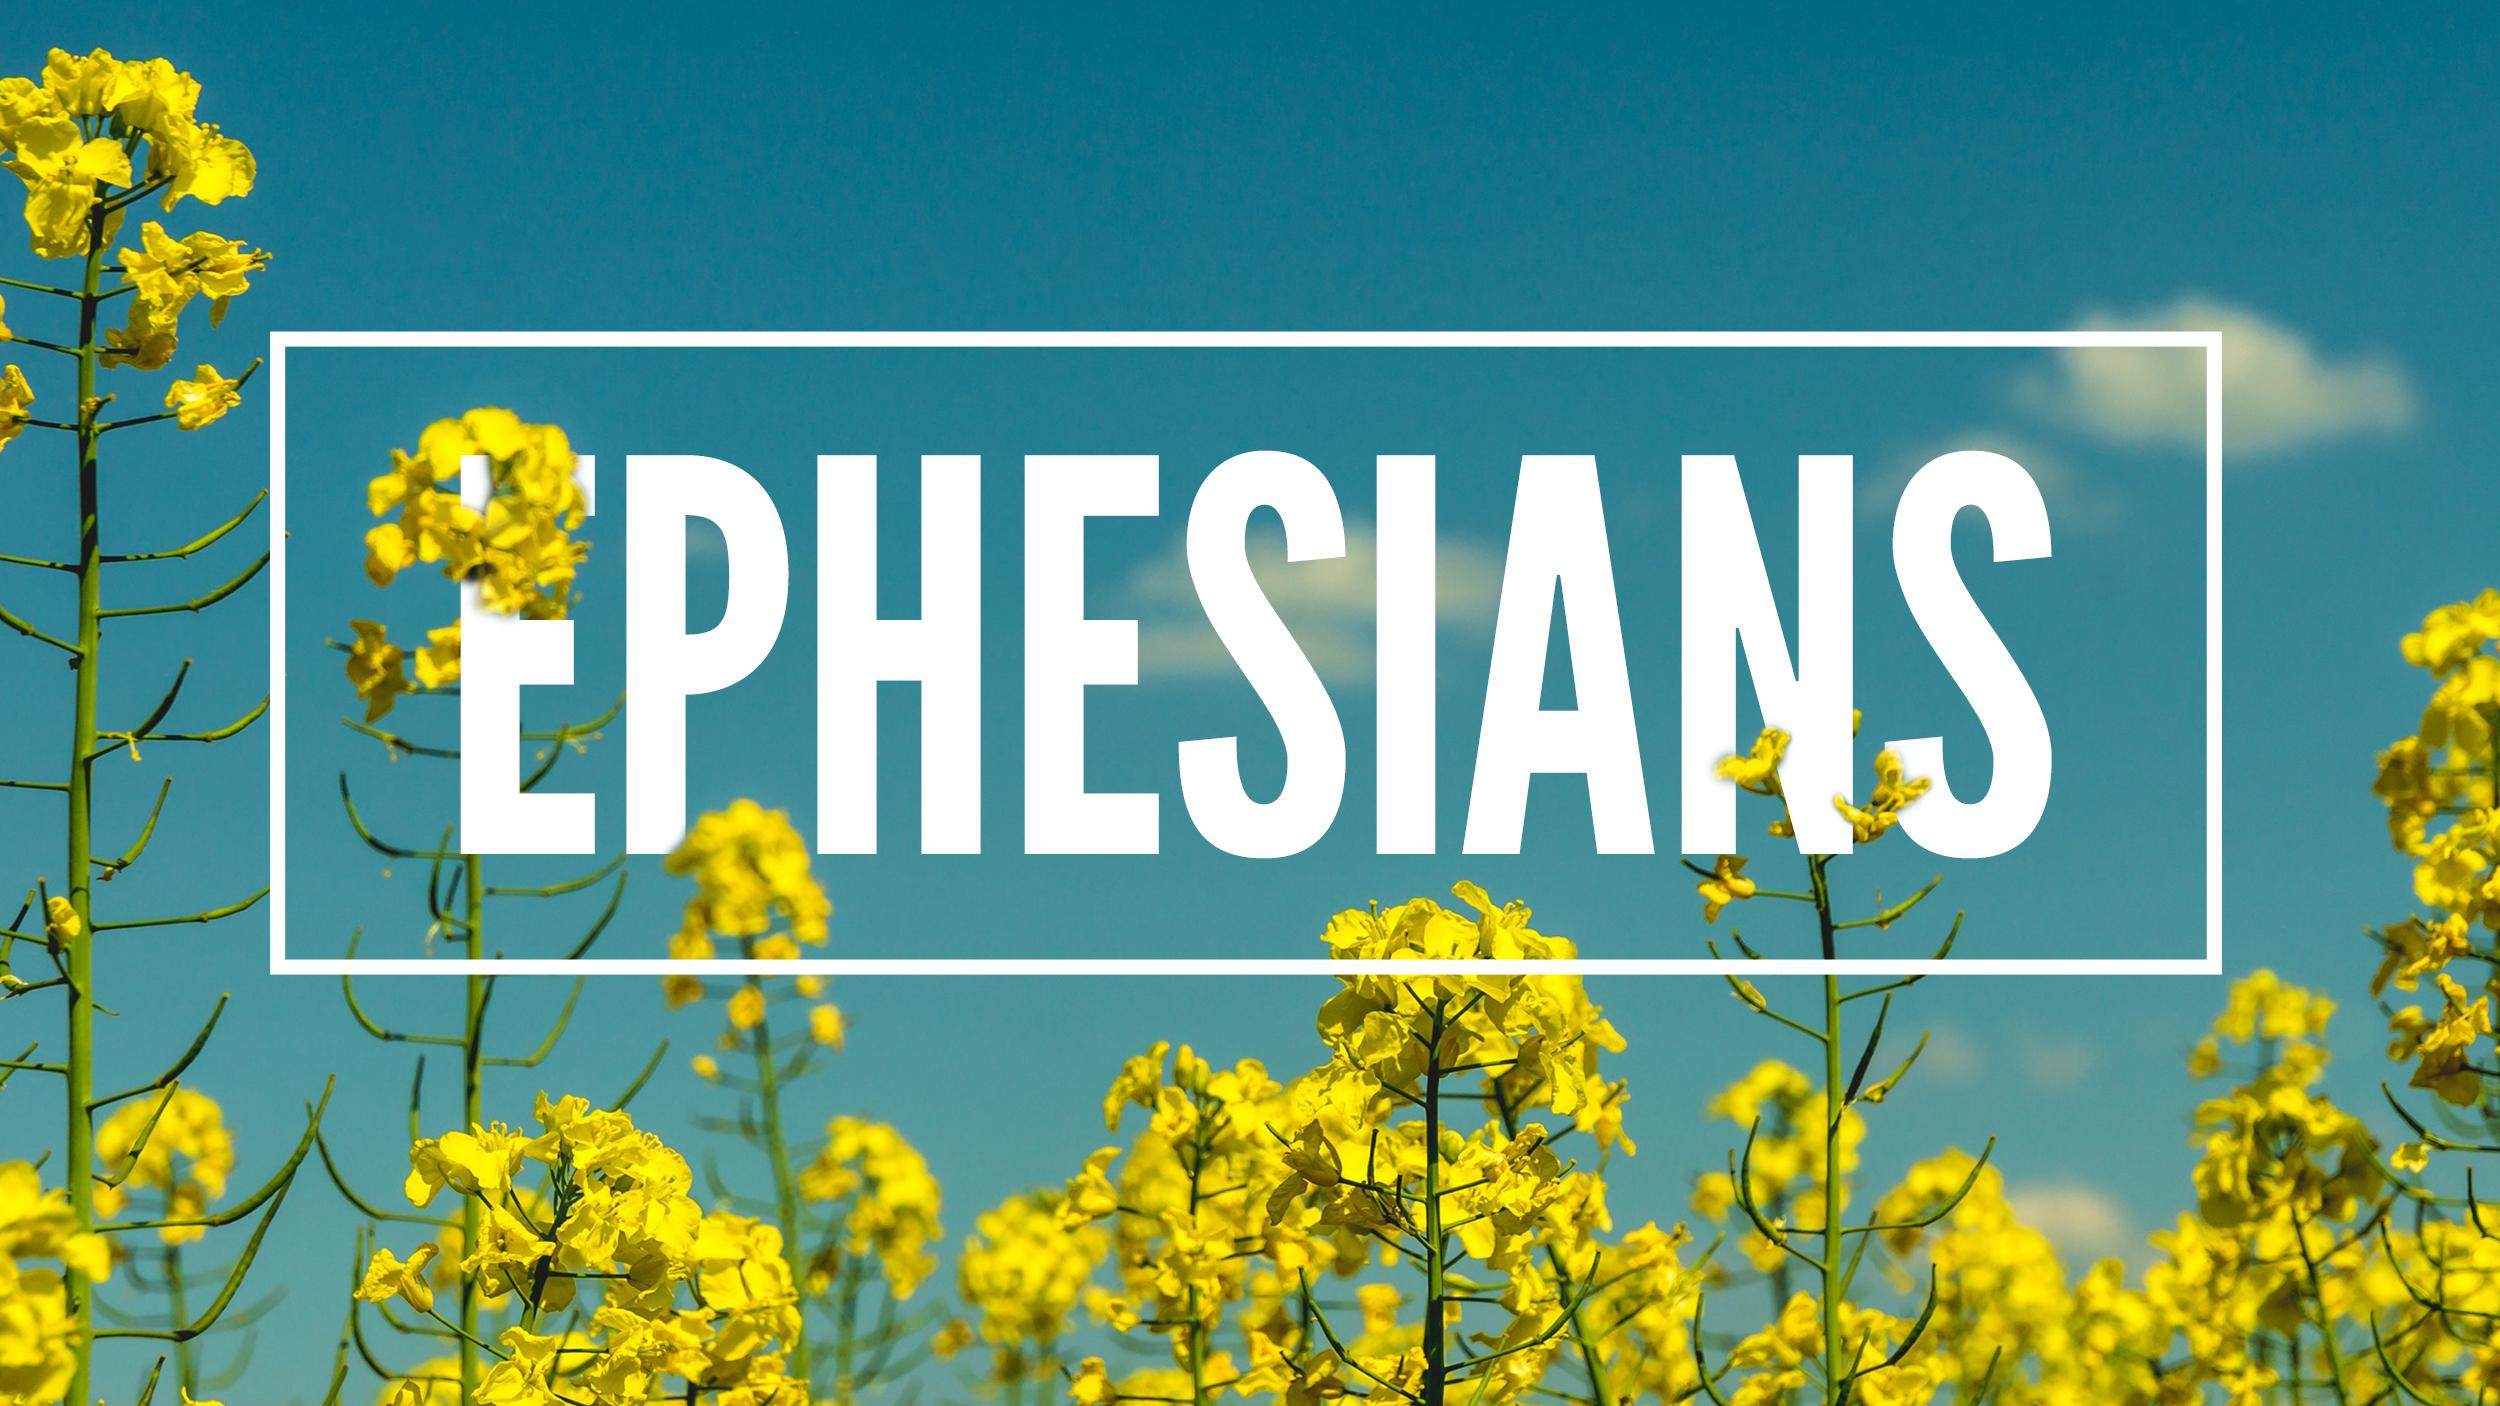 Web_Banner_Ephesians.jpg